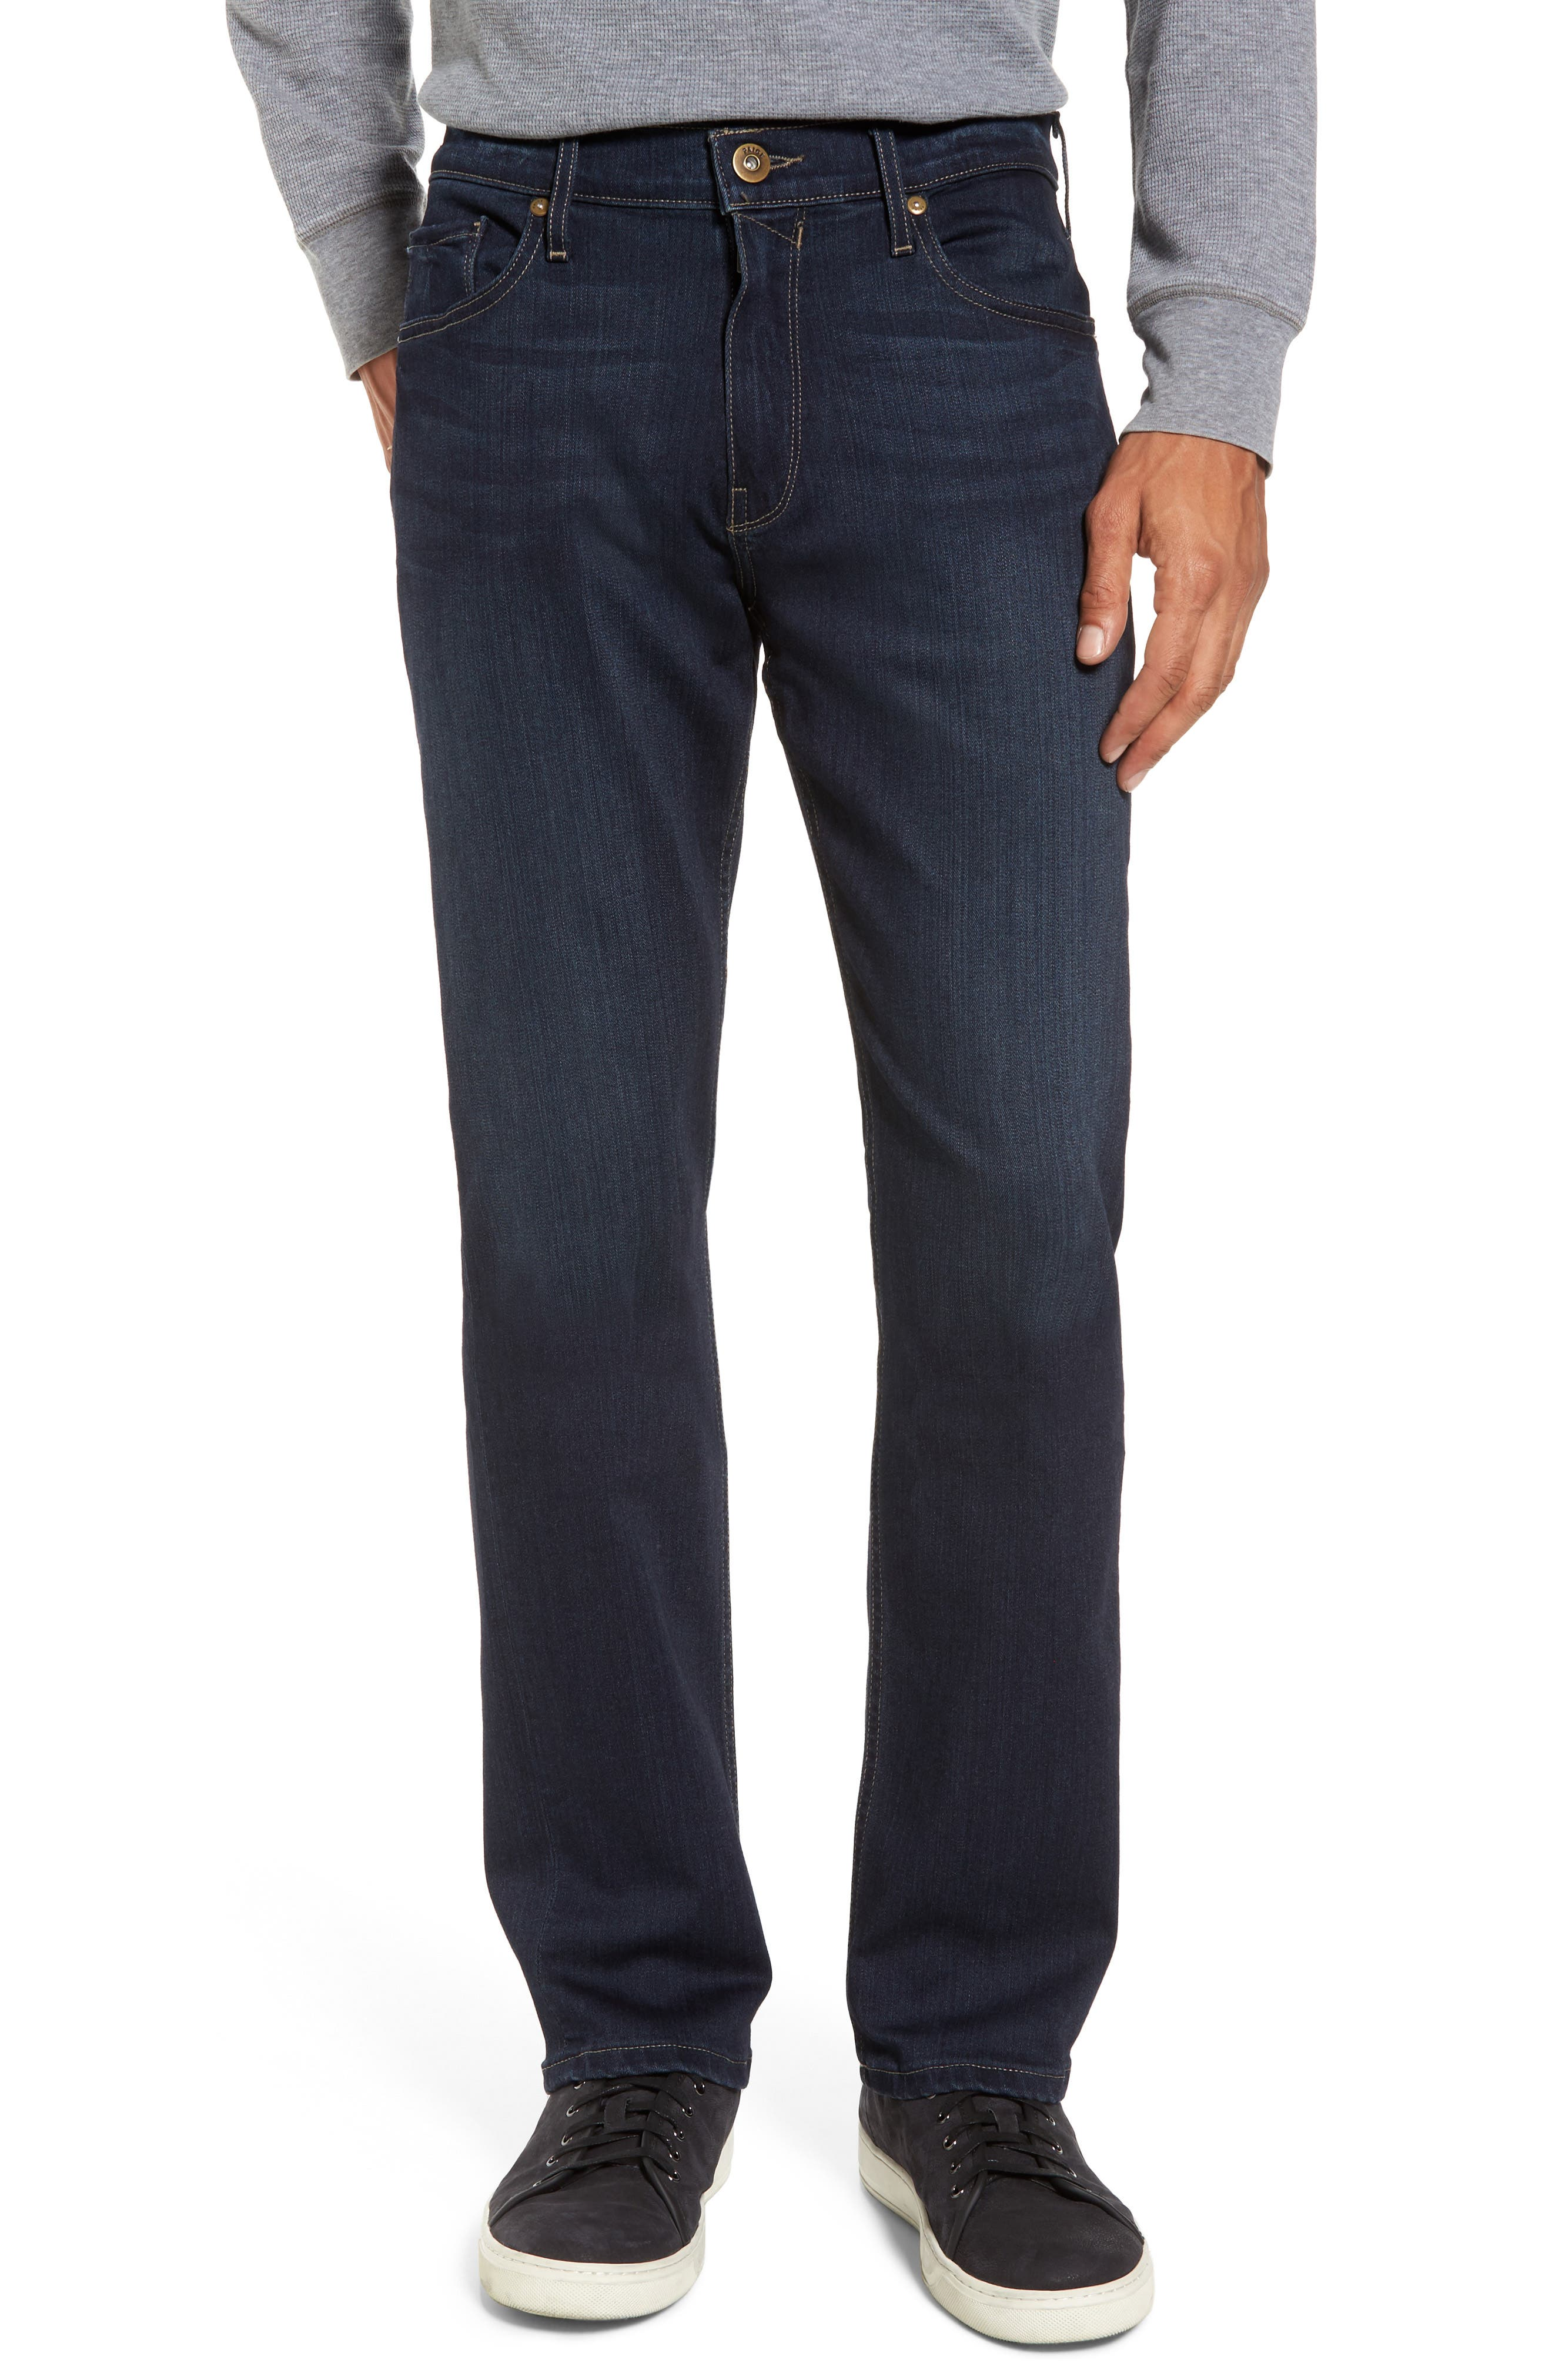 Transcend - Normandie Straight Fit Jeans,                             Main thumbnail 1, color,                             400